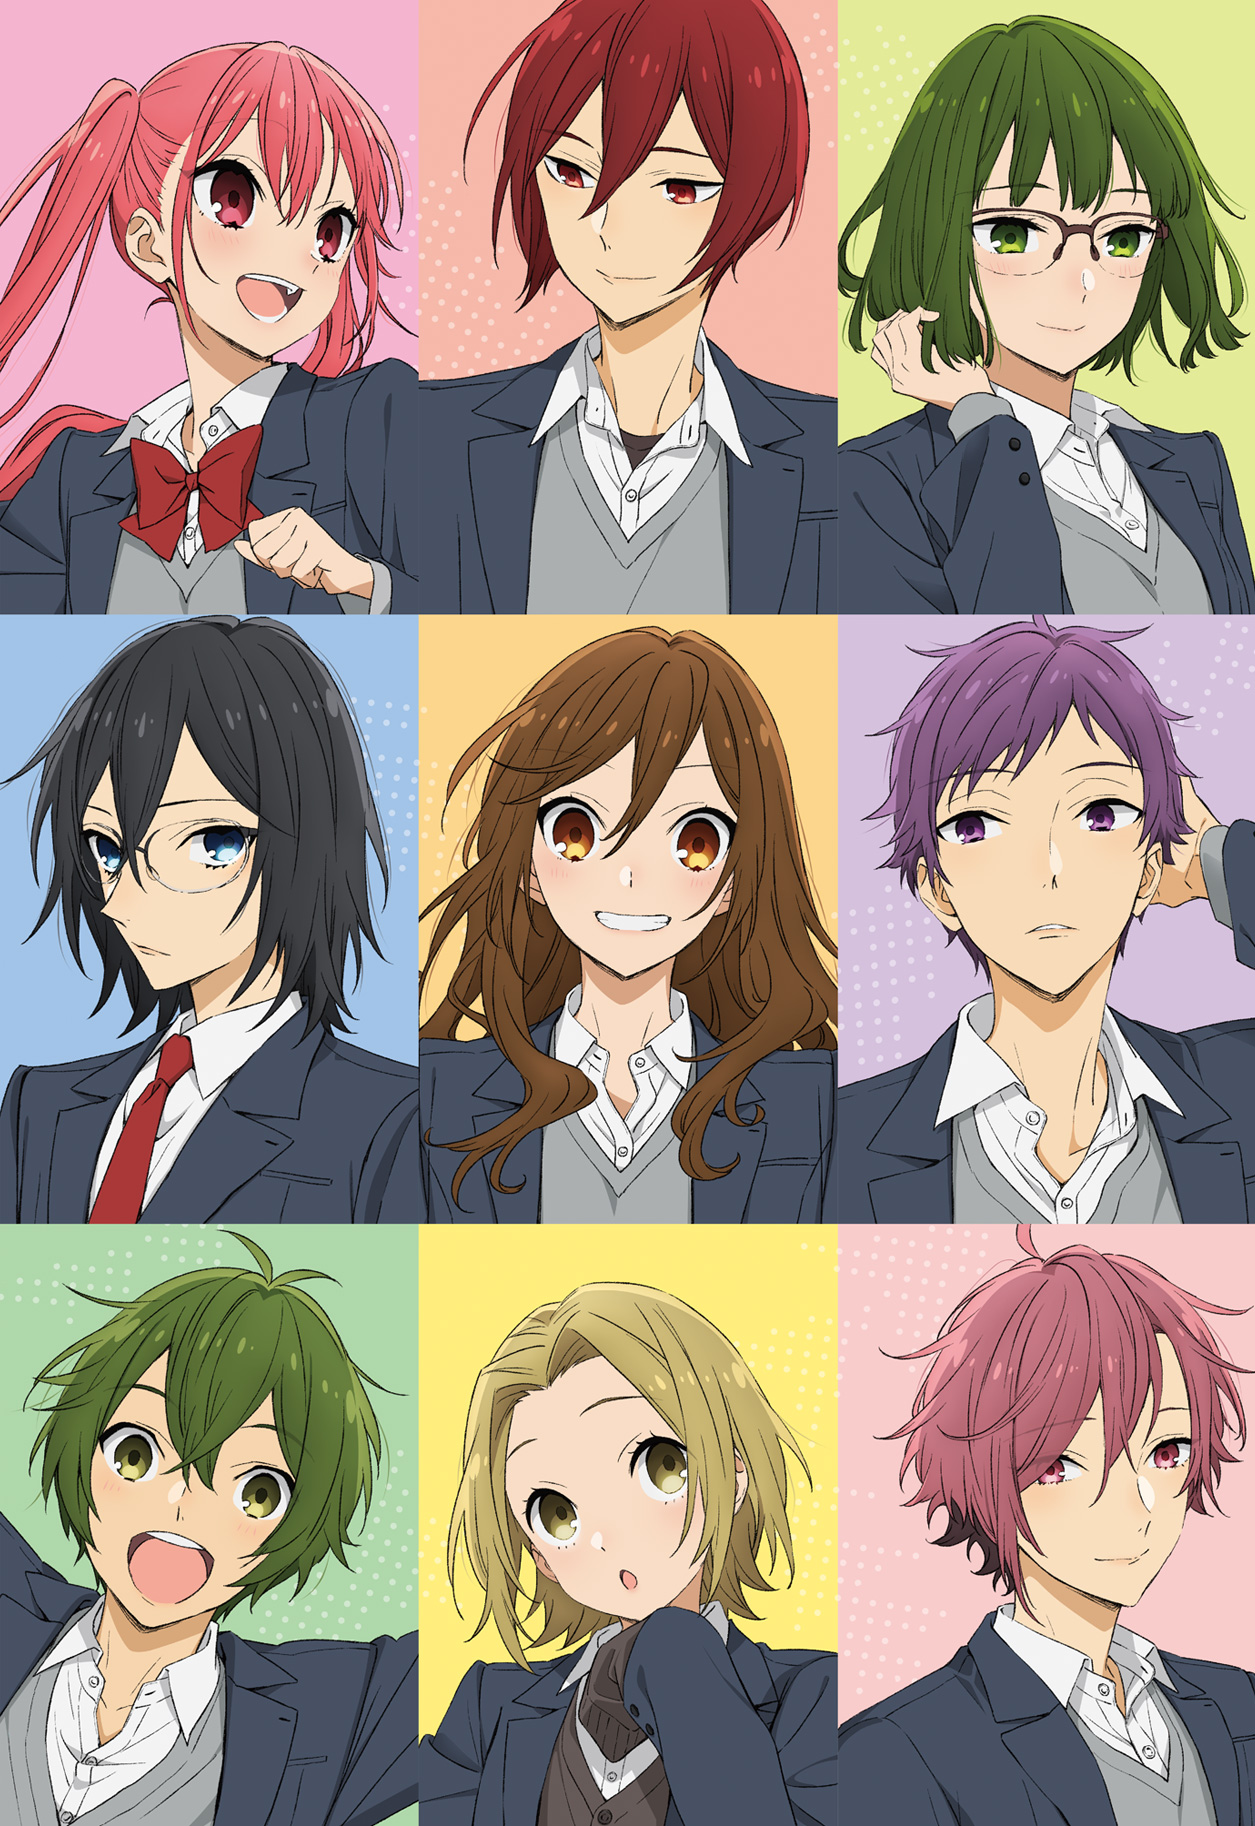 TVアニメ「ホリミヤ」公式サイト